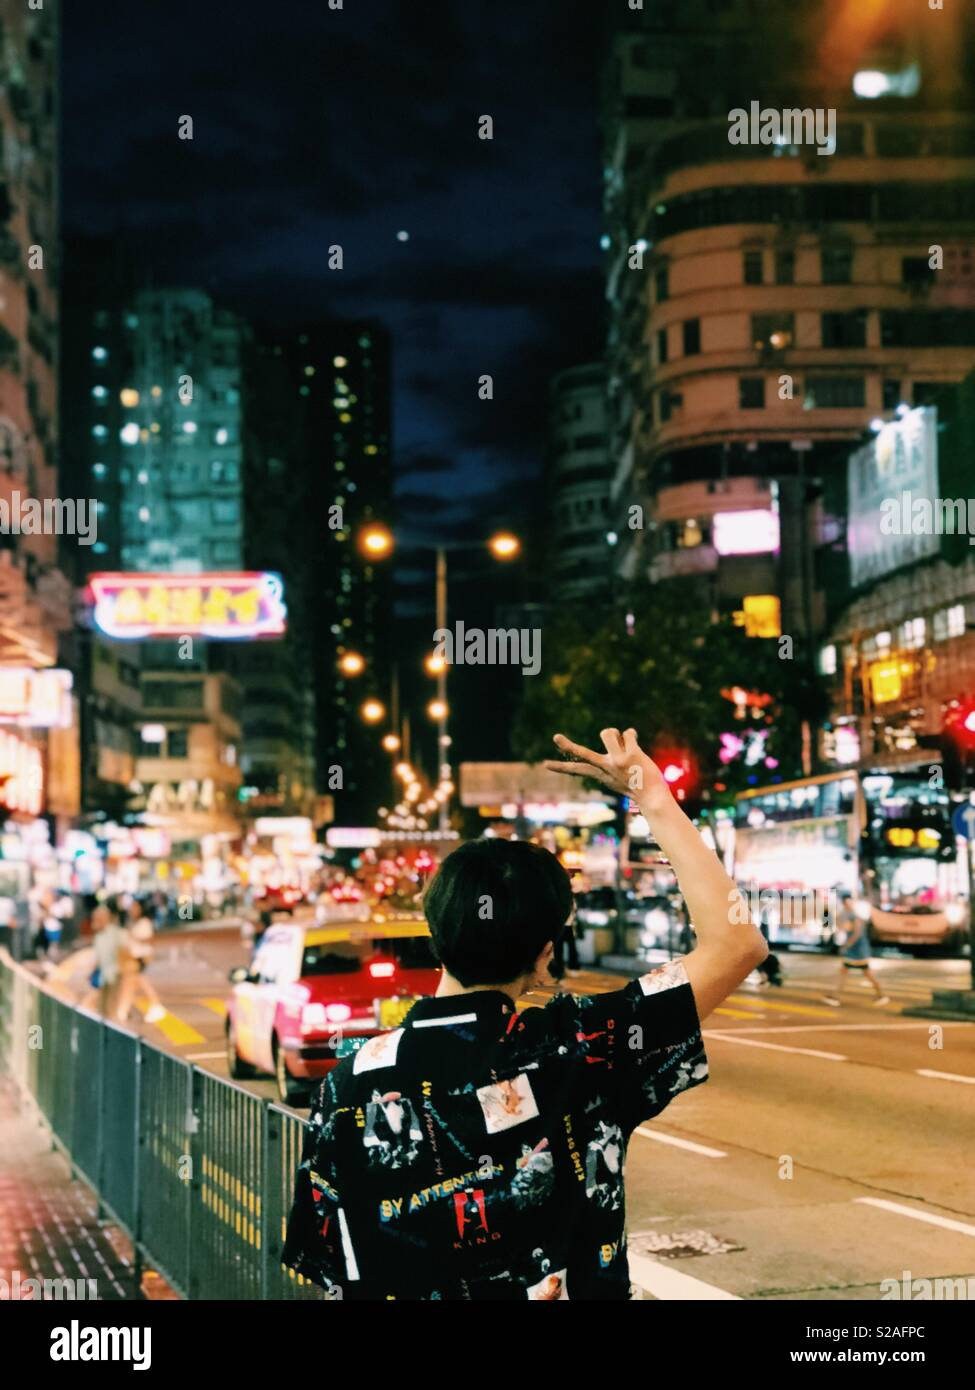 City Light✨ Photo Stock